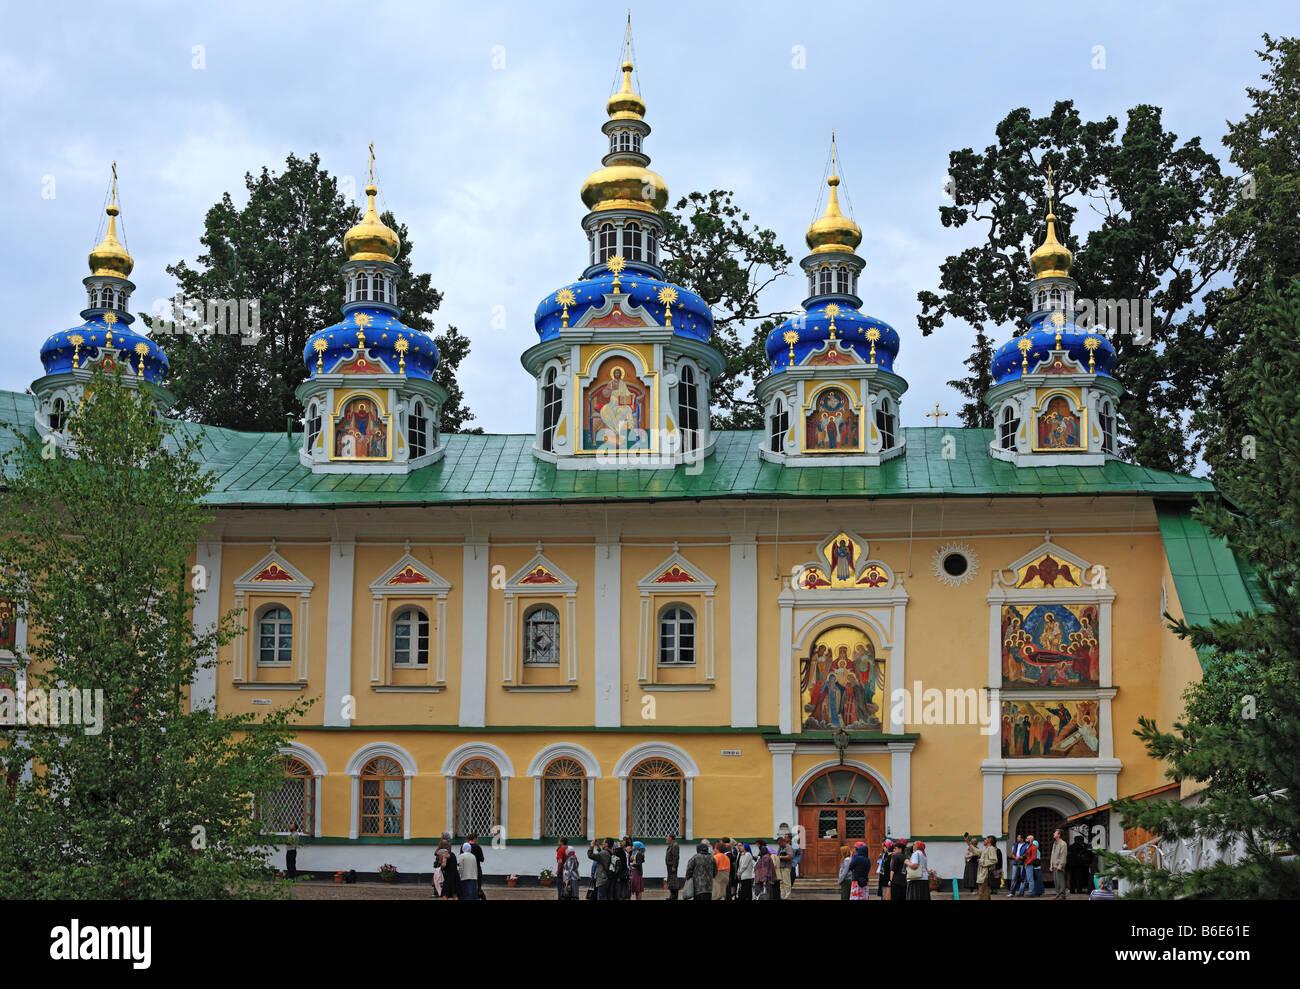 Pskovo-Pechersky Monastery: how to get there 91